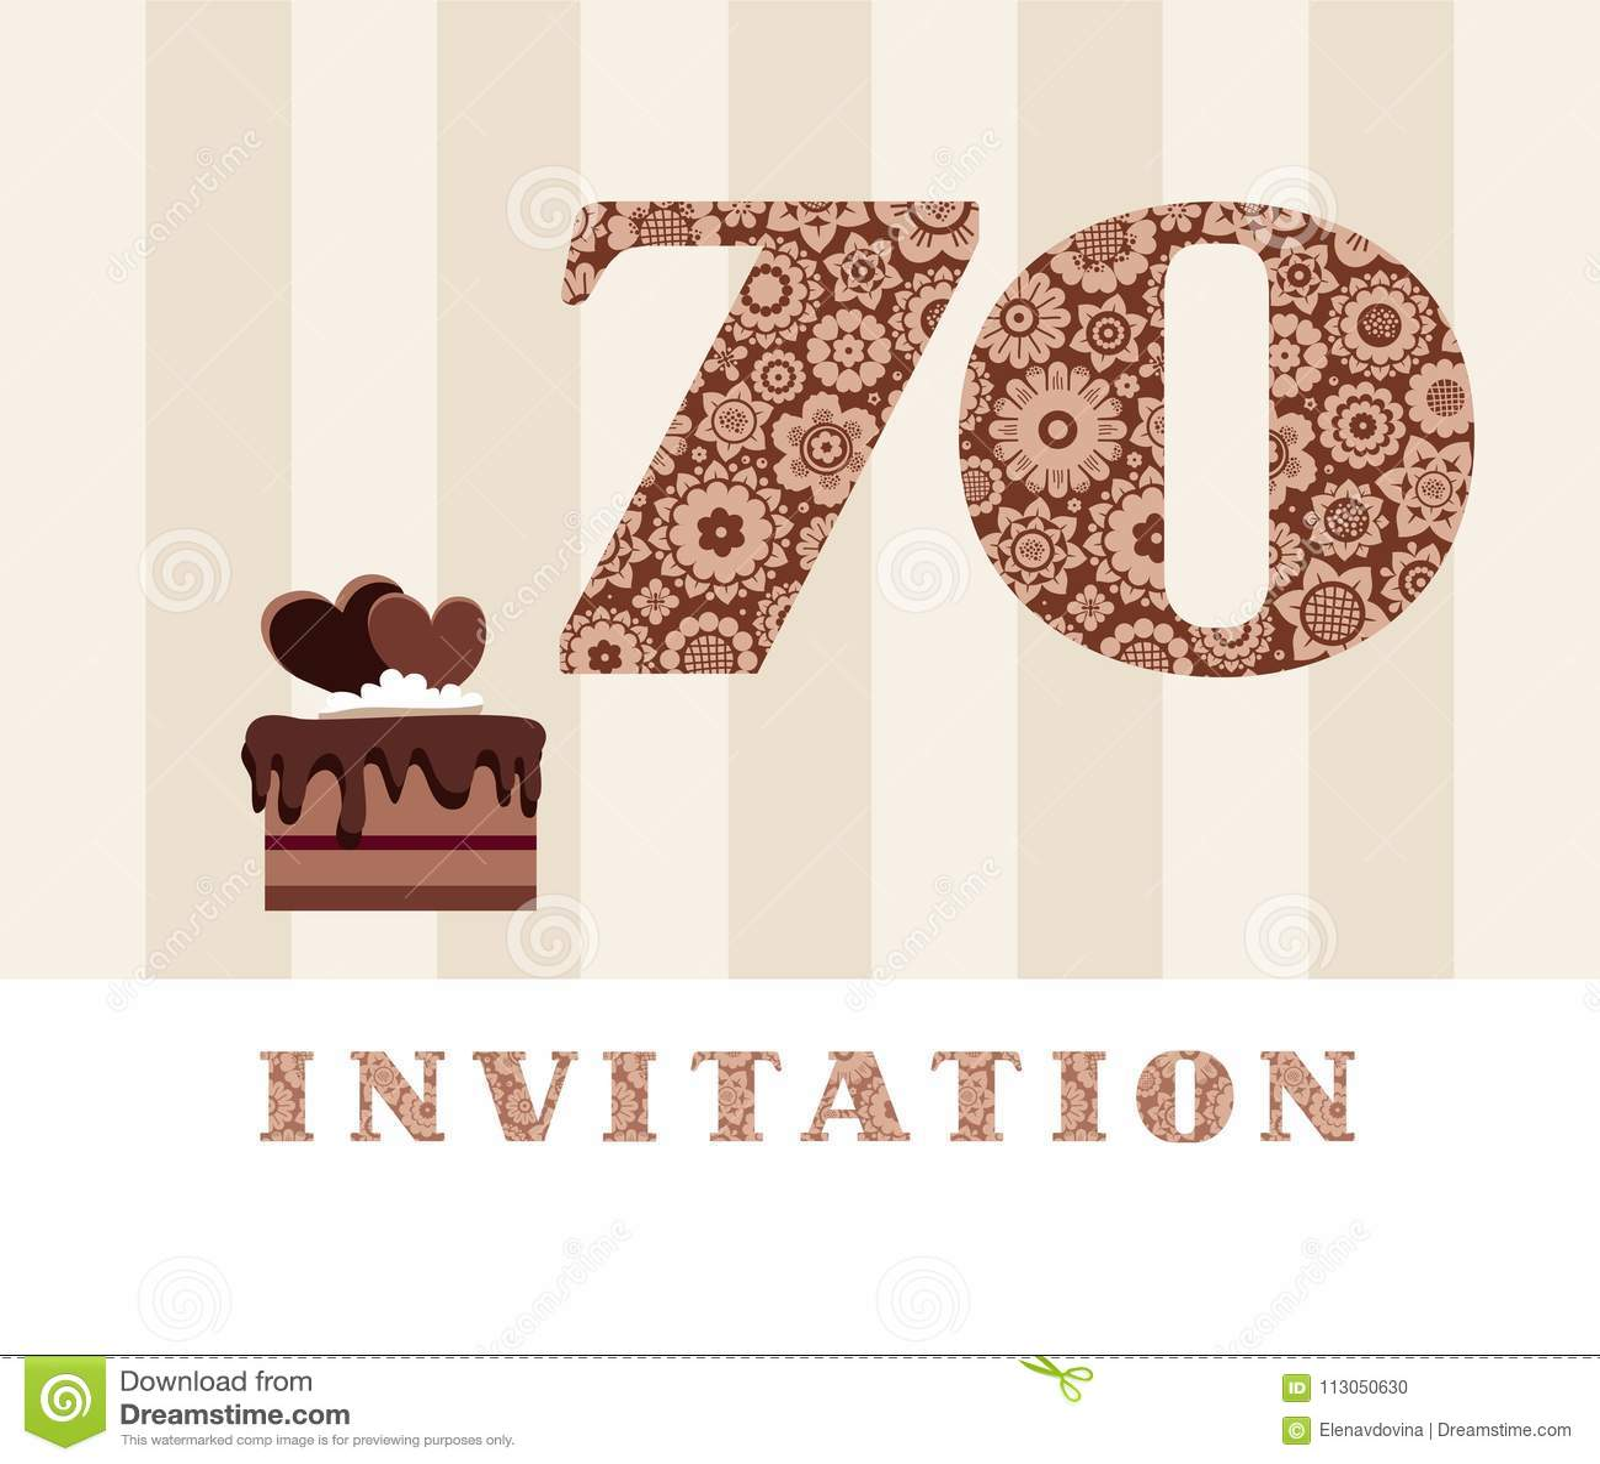 Invitation 70 Years Old Chocolate Cake Heart Vector